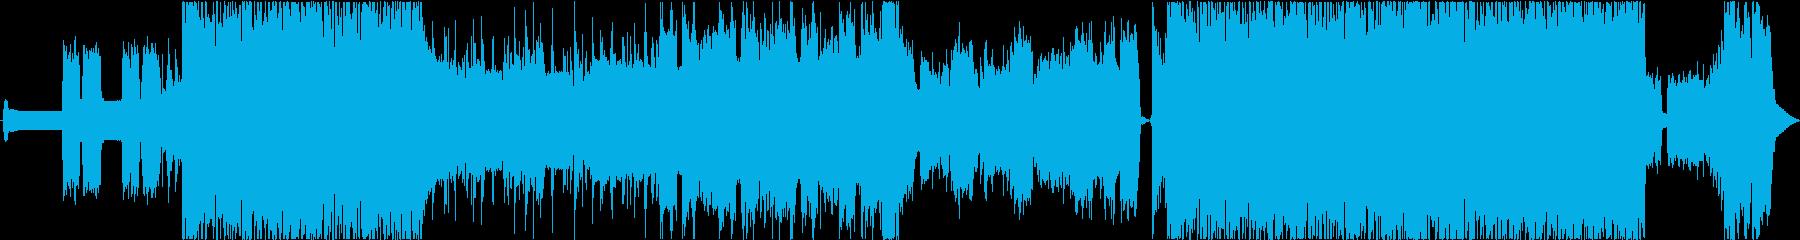 GAME】中ボス戦用ハードロックの再生済みの波形